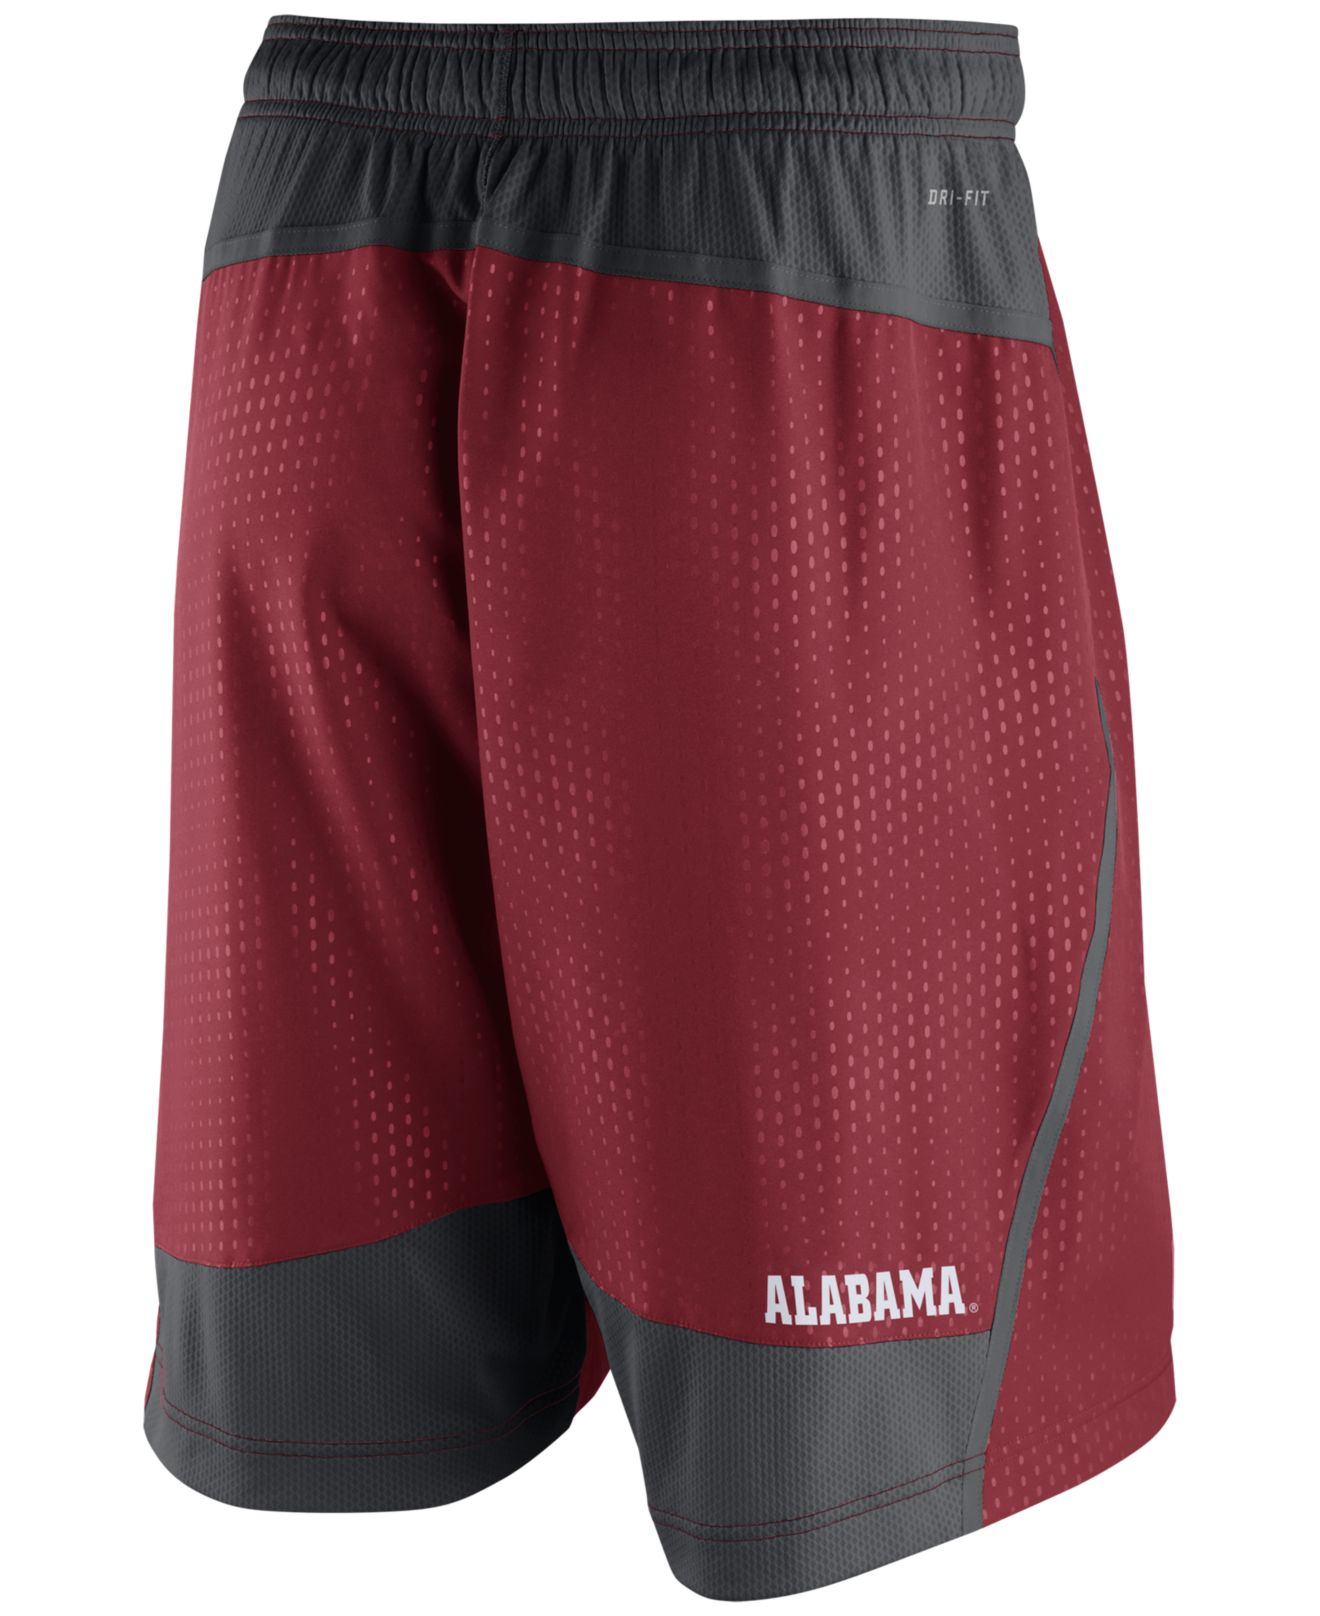 alabama gants Nike